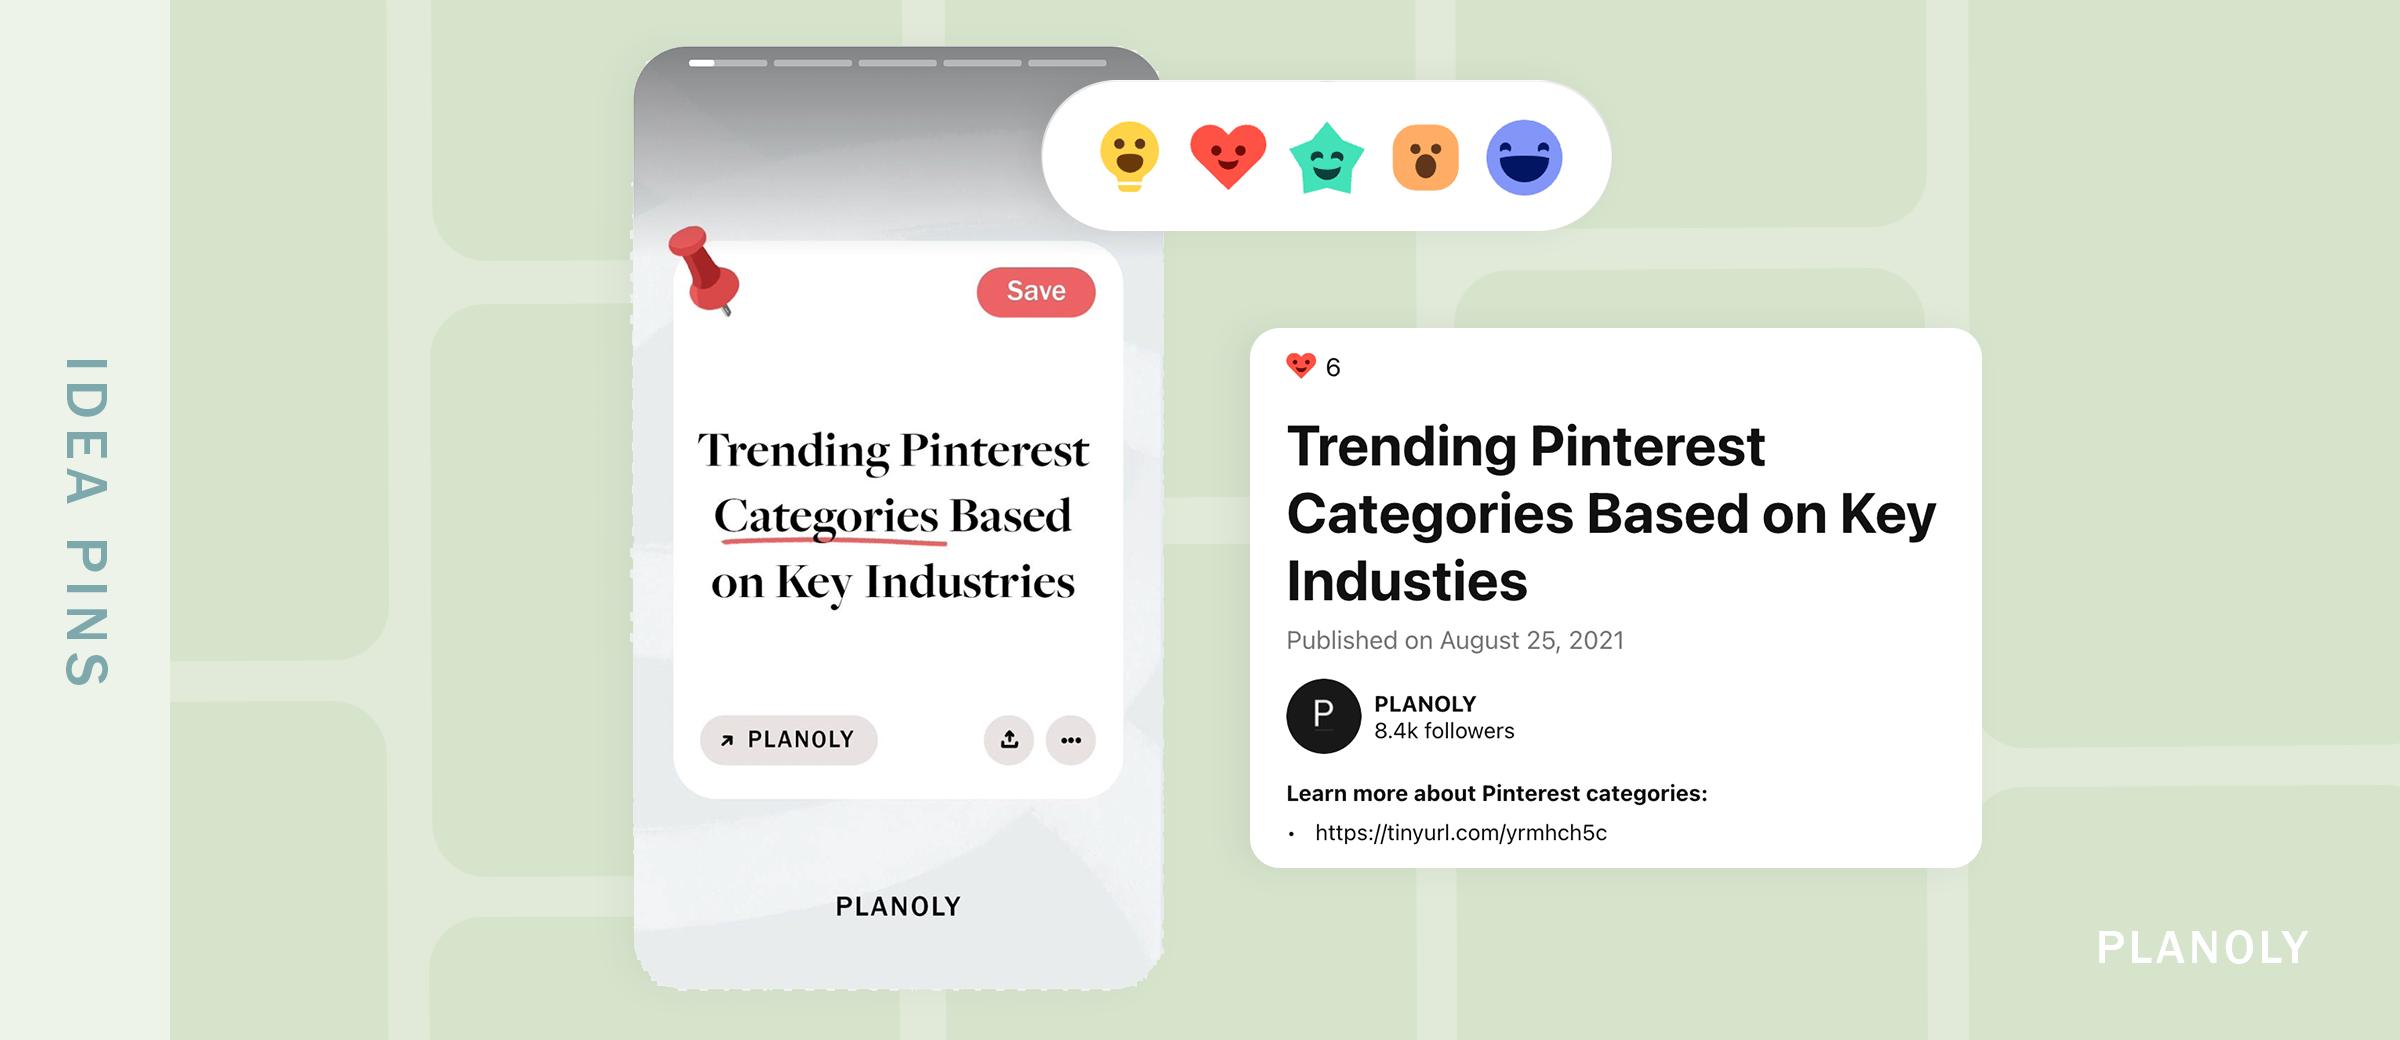 PLANOLY-Blog Post-Pinterest Search-Horizontal Img 3